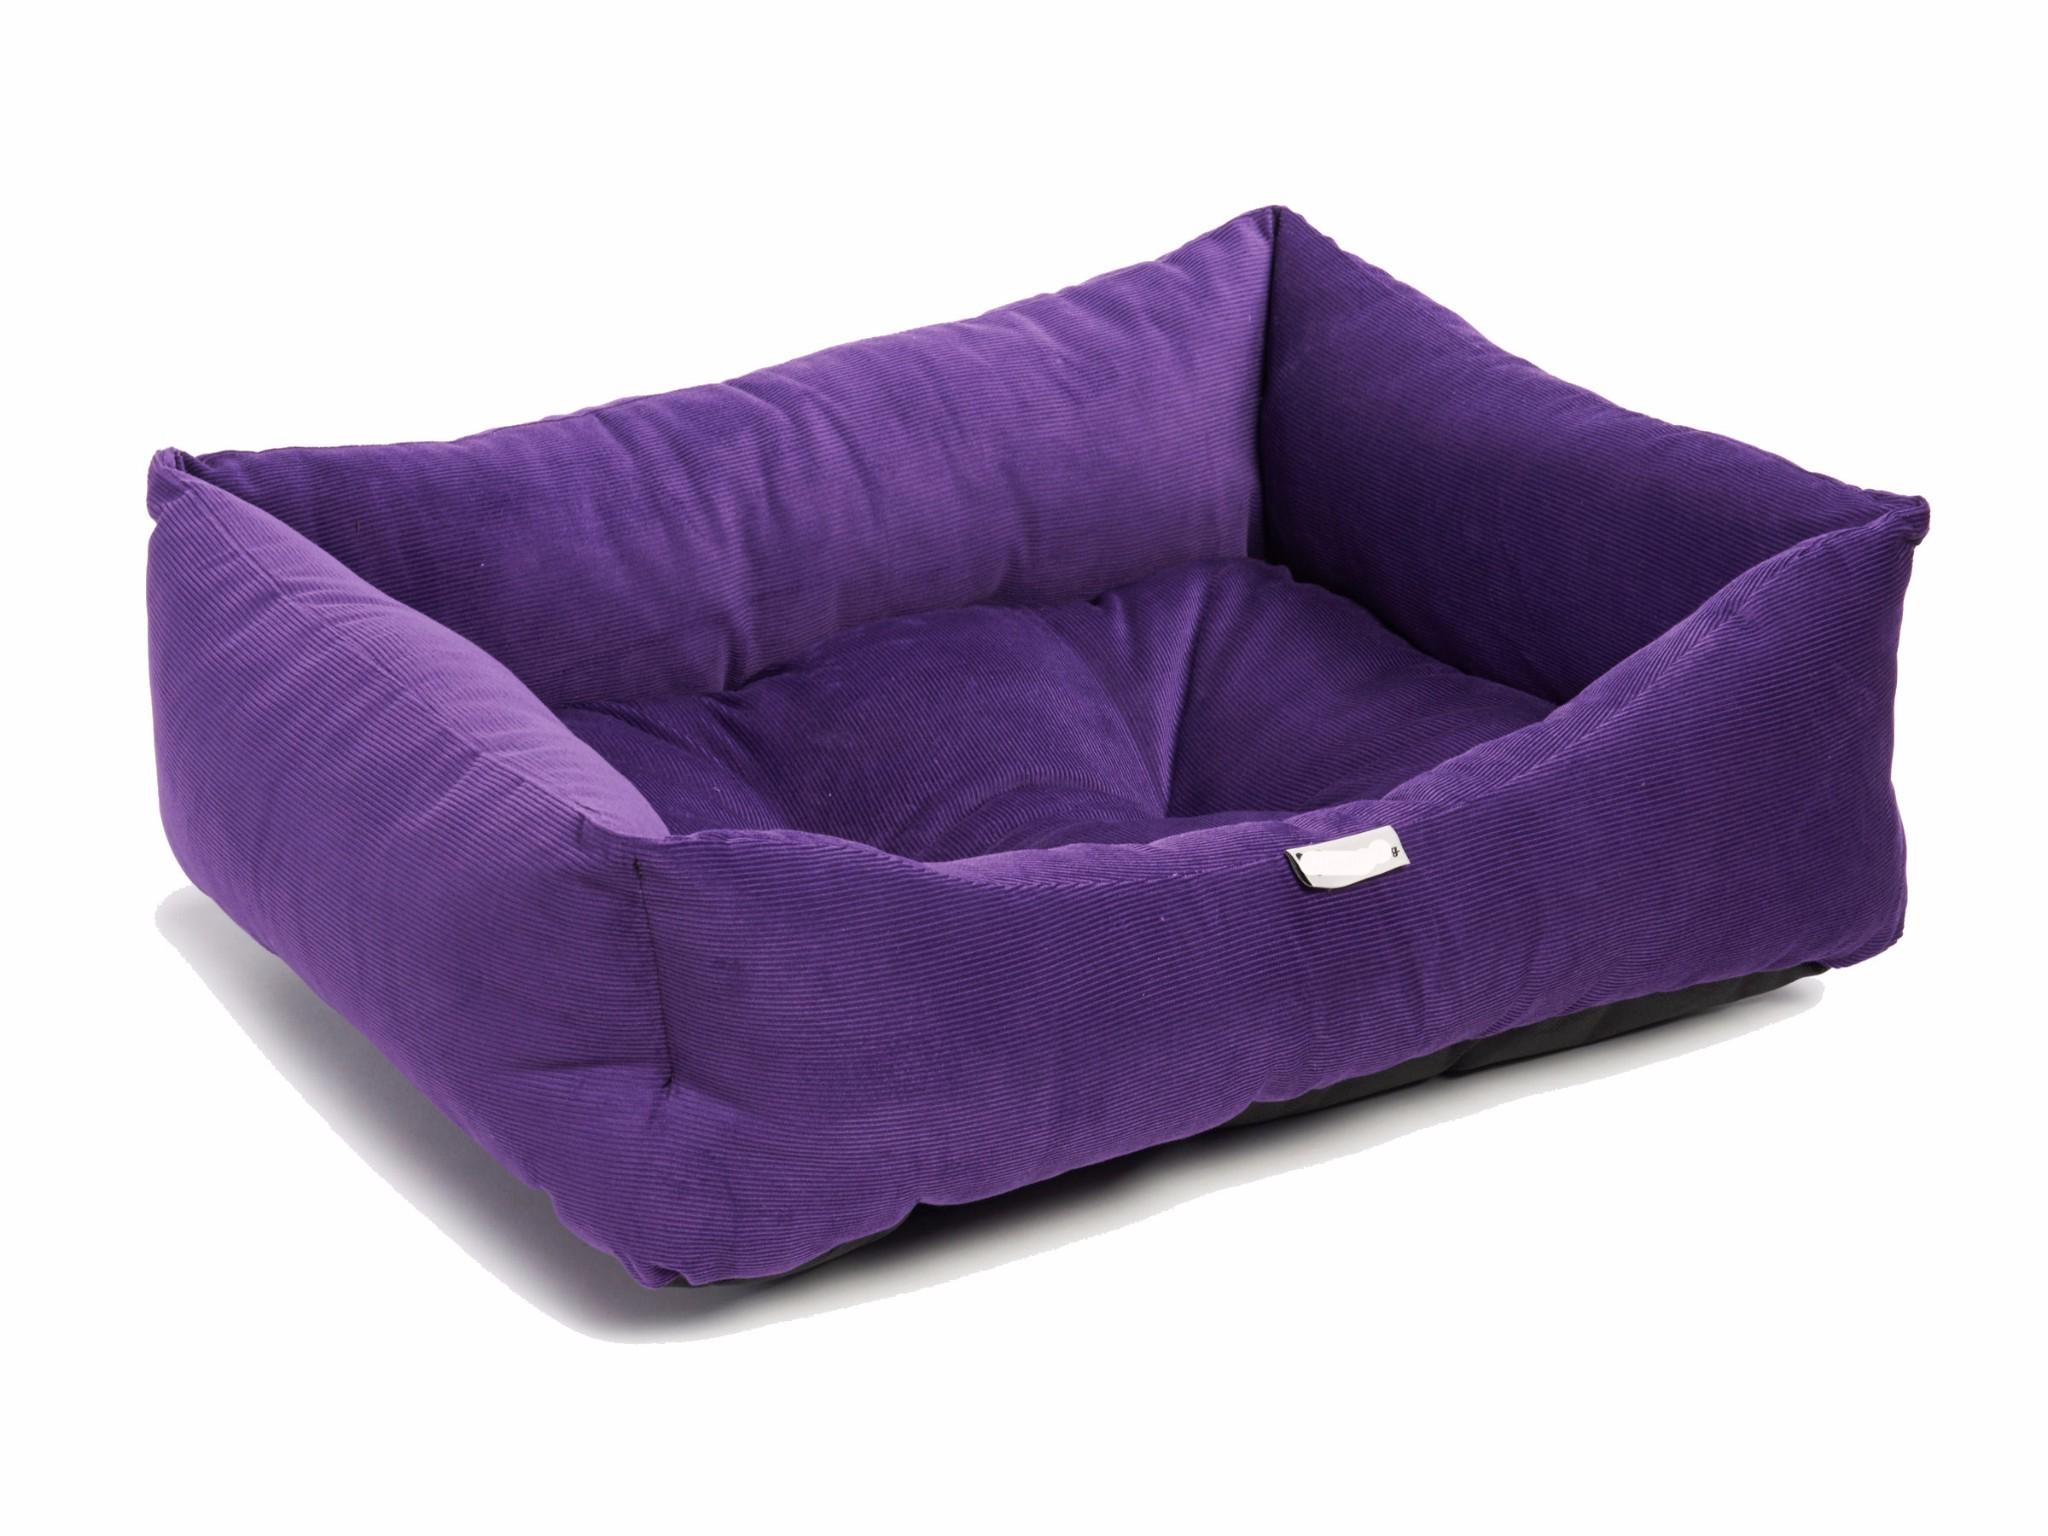 purple cord bed. Black Bedroom Furniture Sets. Home Design Ideas